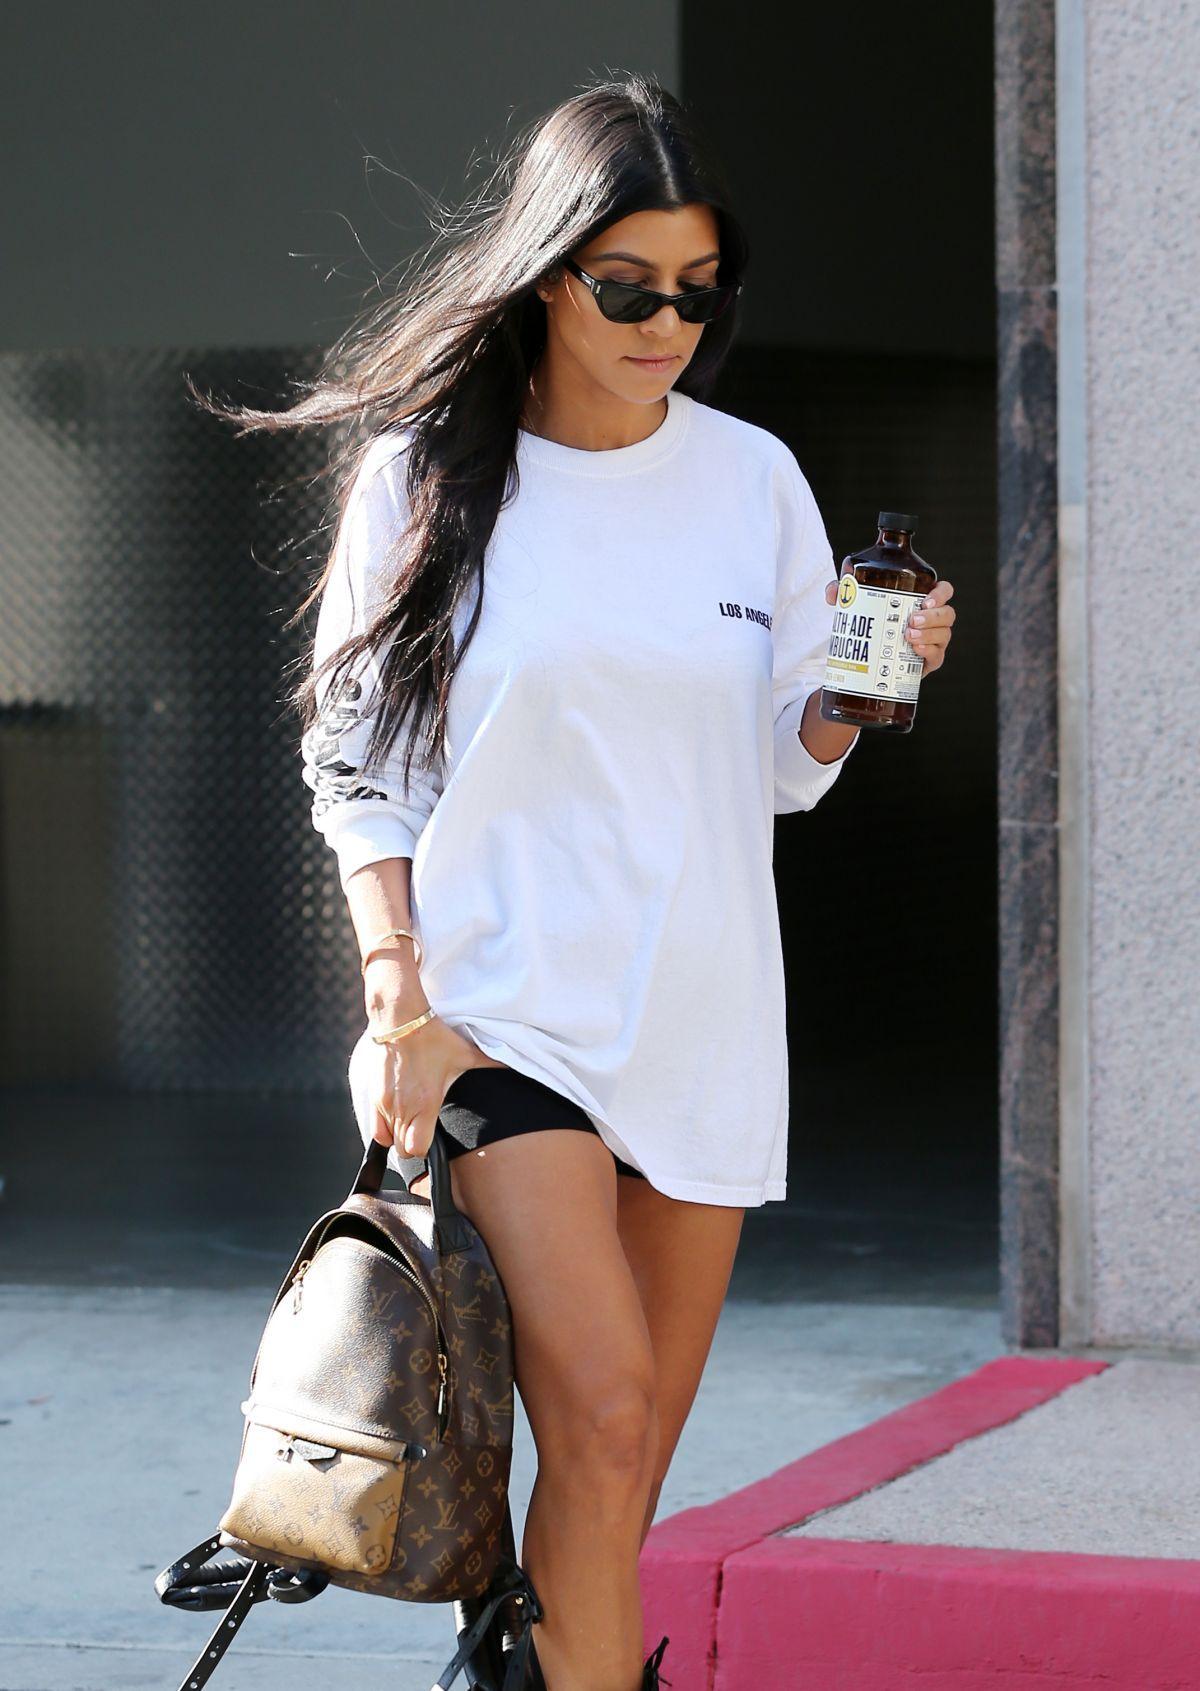 Paparazzi Kourtney Kardashian naked (16 foto and video), Pussy, Leaked, Instagram, in bikini 2019